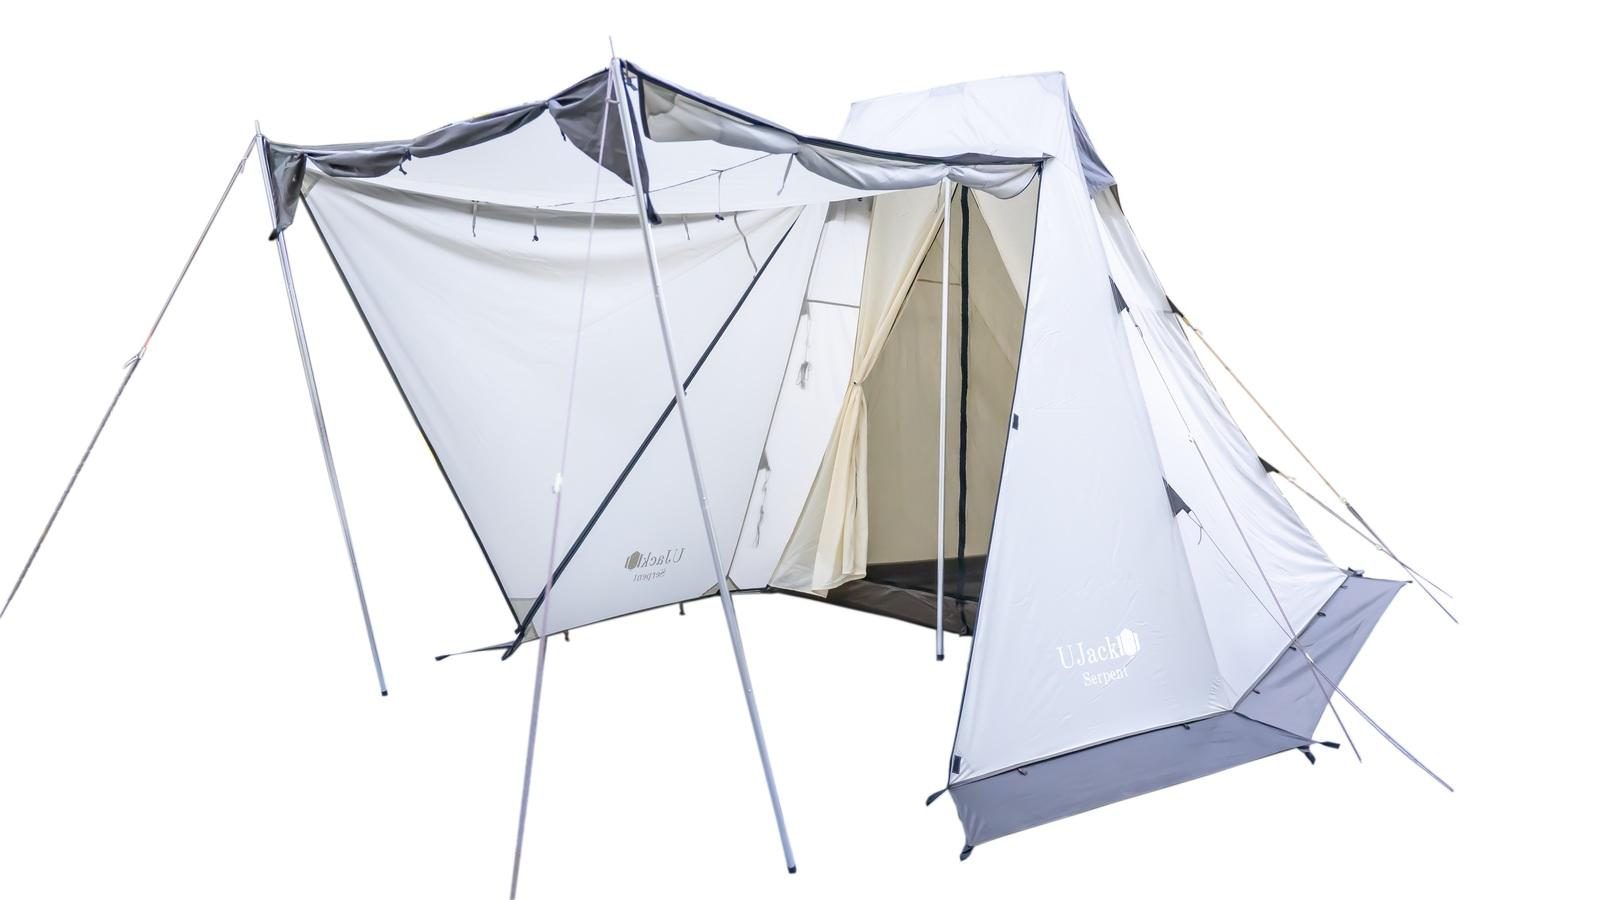 UJack(ユージャック) サーペントテント ソロ ワンポール テント 1人用 2人用 Serpent